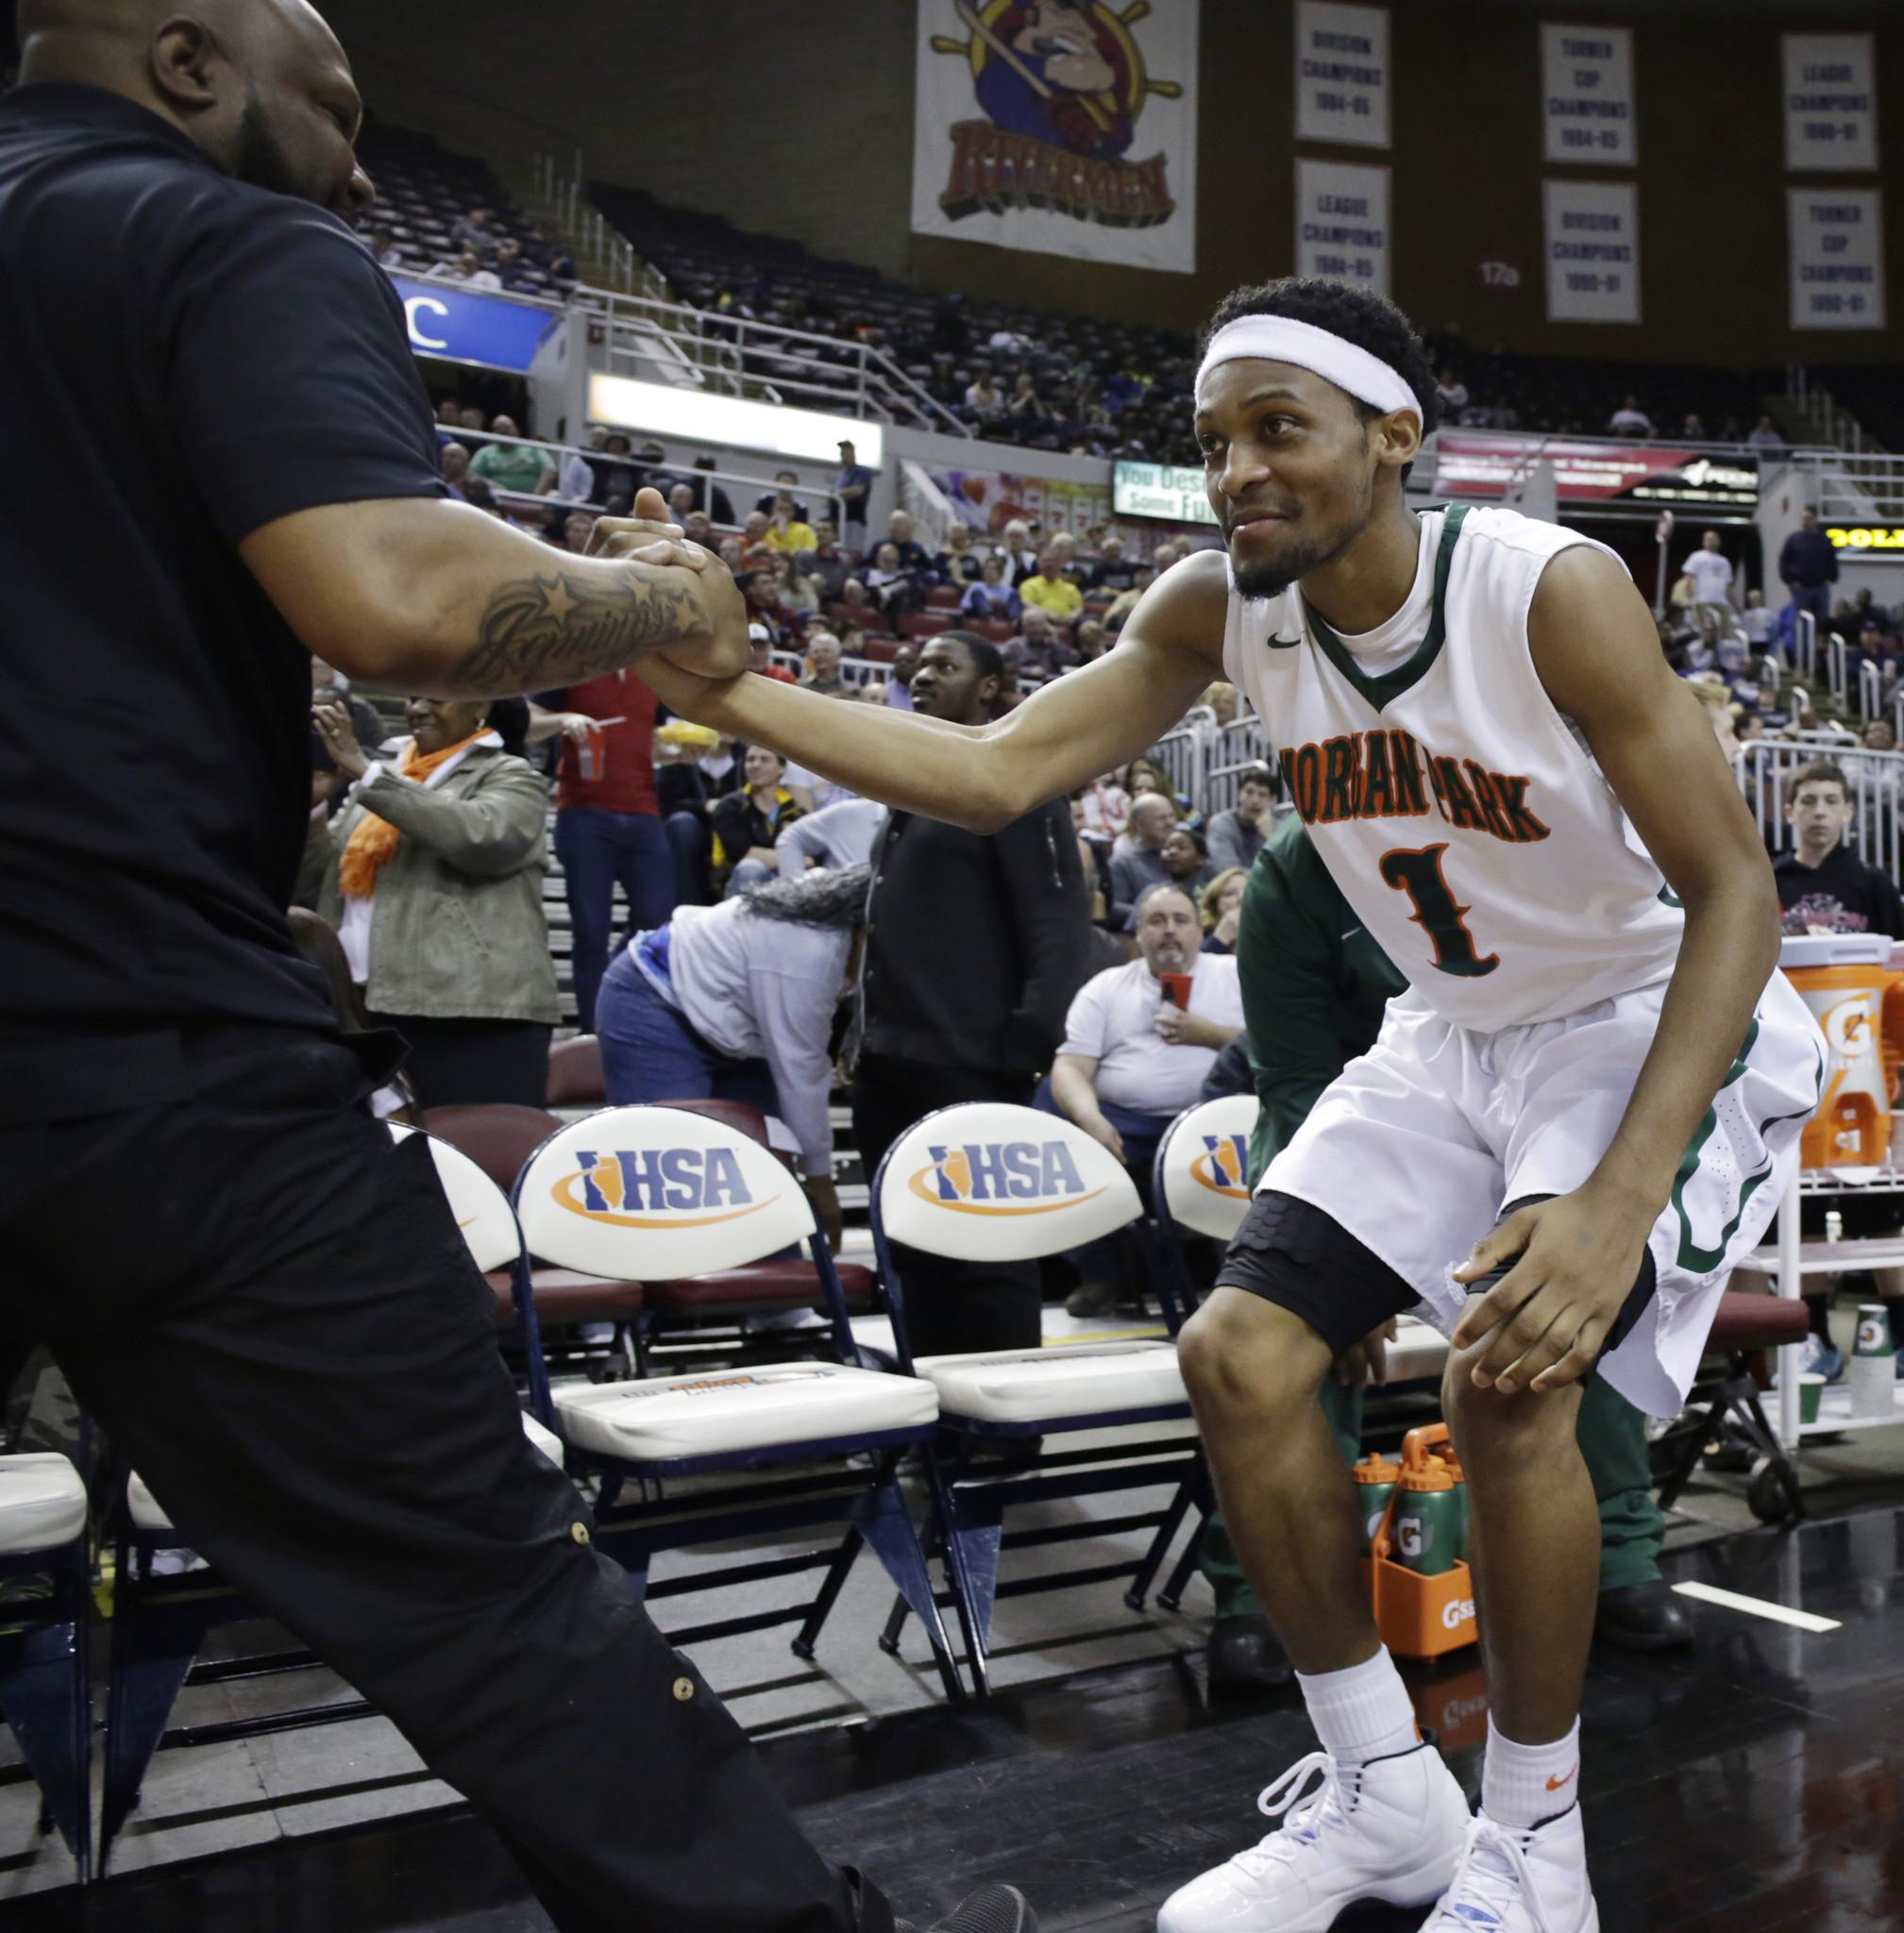 Big Weekend In High School Basketball: Boys Basketball Blog: Mike Helfgot Recaps Championship